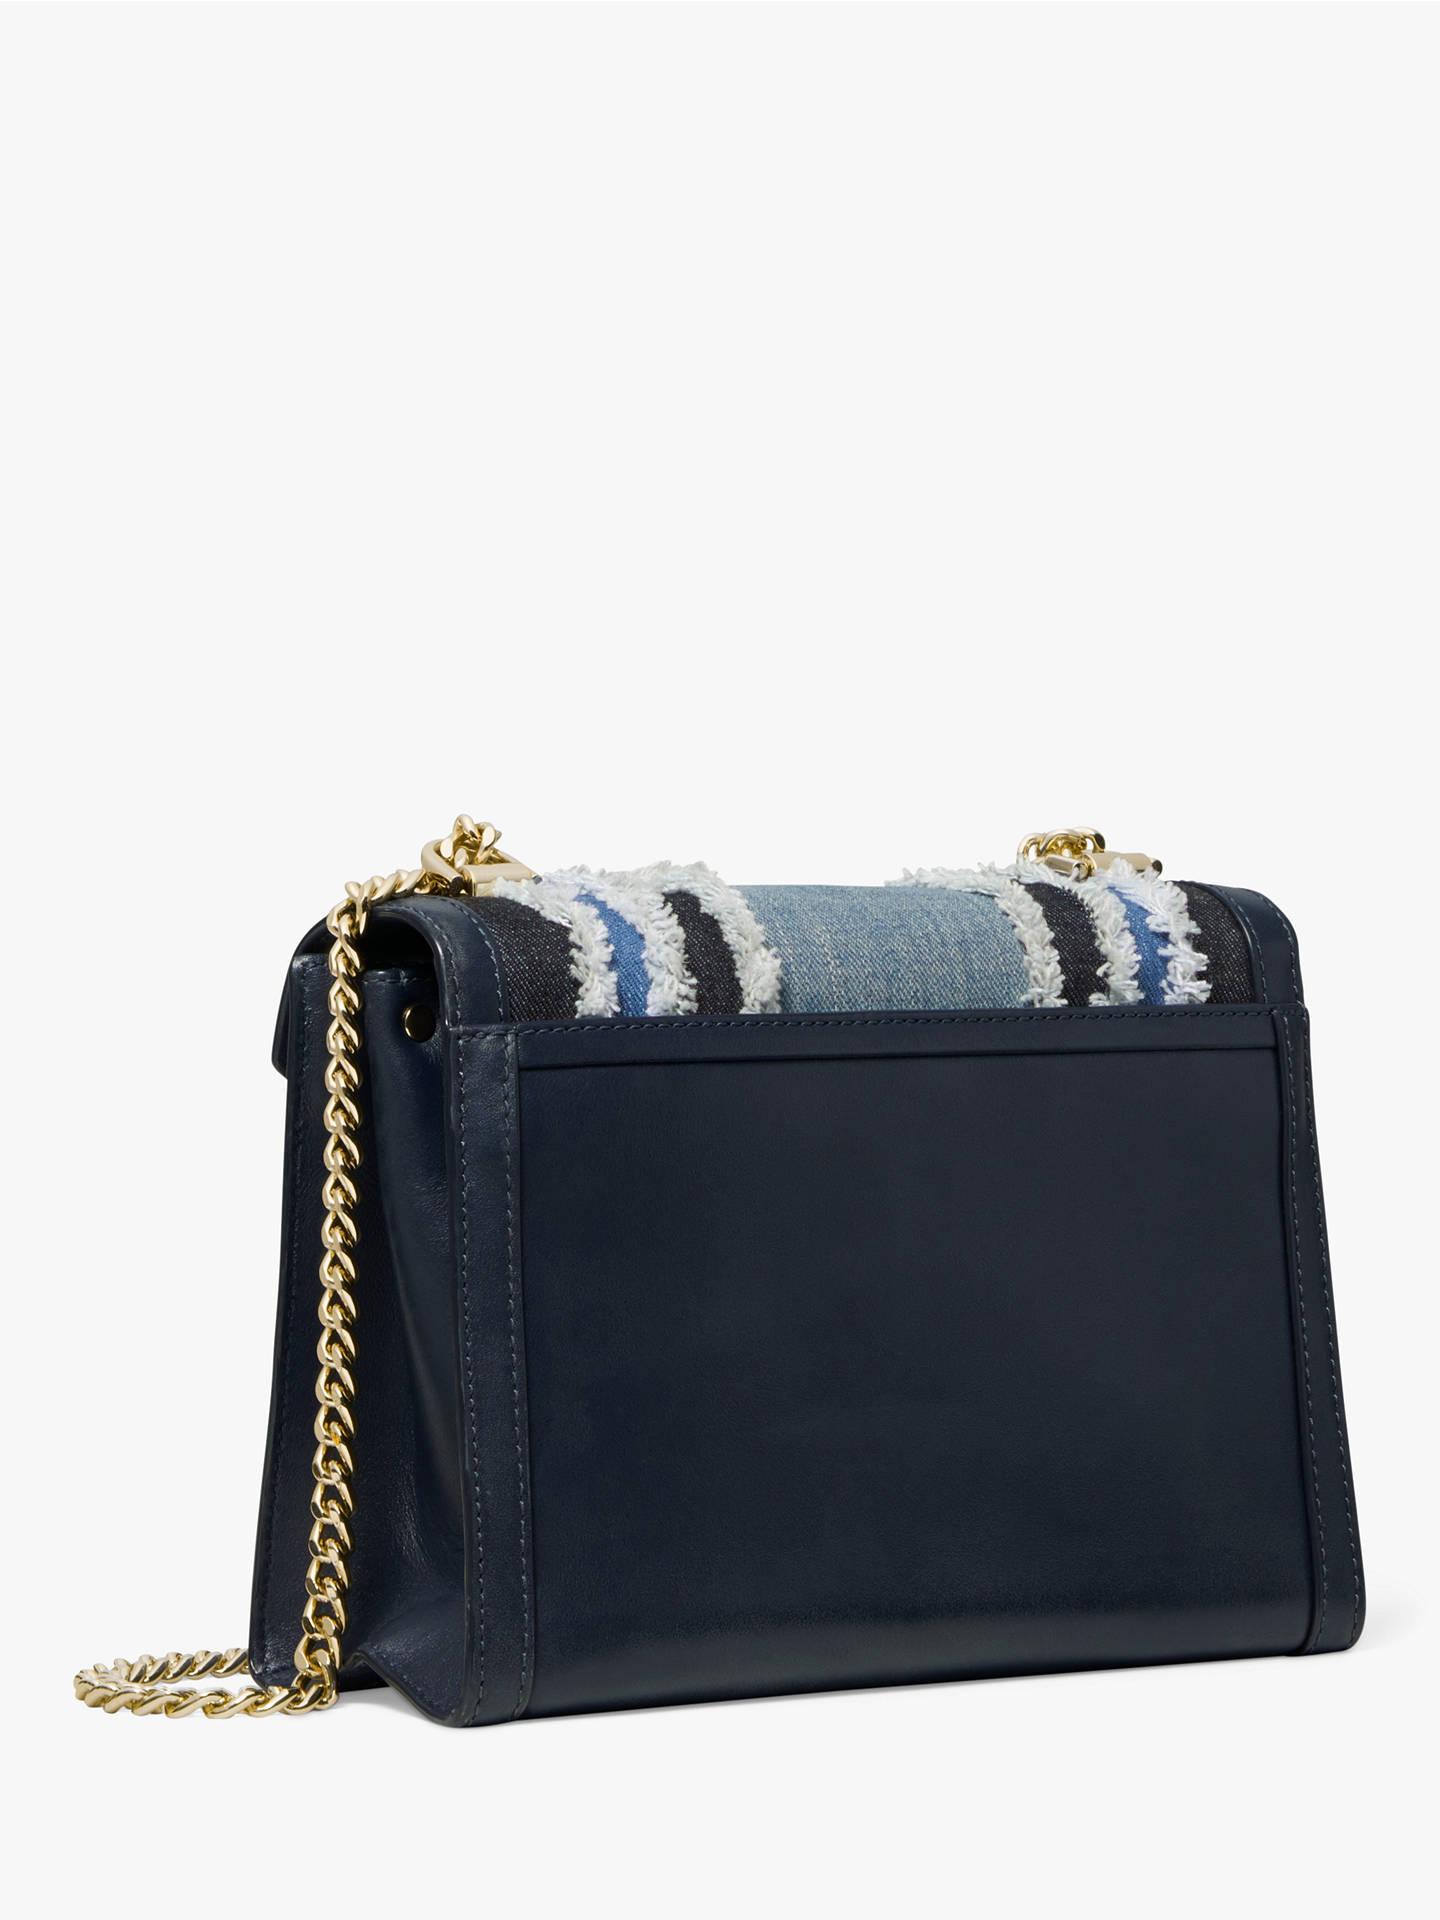 2b02f2bcf66187 ... Buy MICHAEL Michael Kors Whitney Large Chain Strap Shoulder Bag, Denim  Multi Texture Online at ...